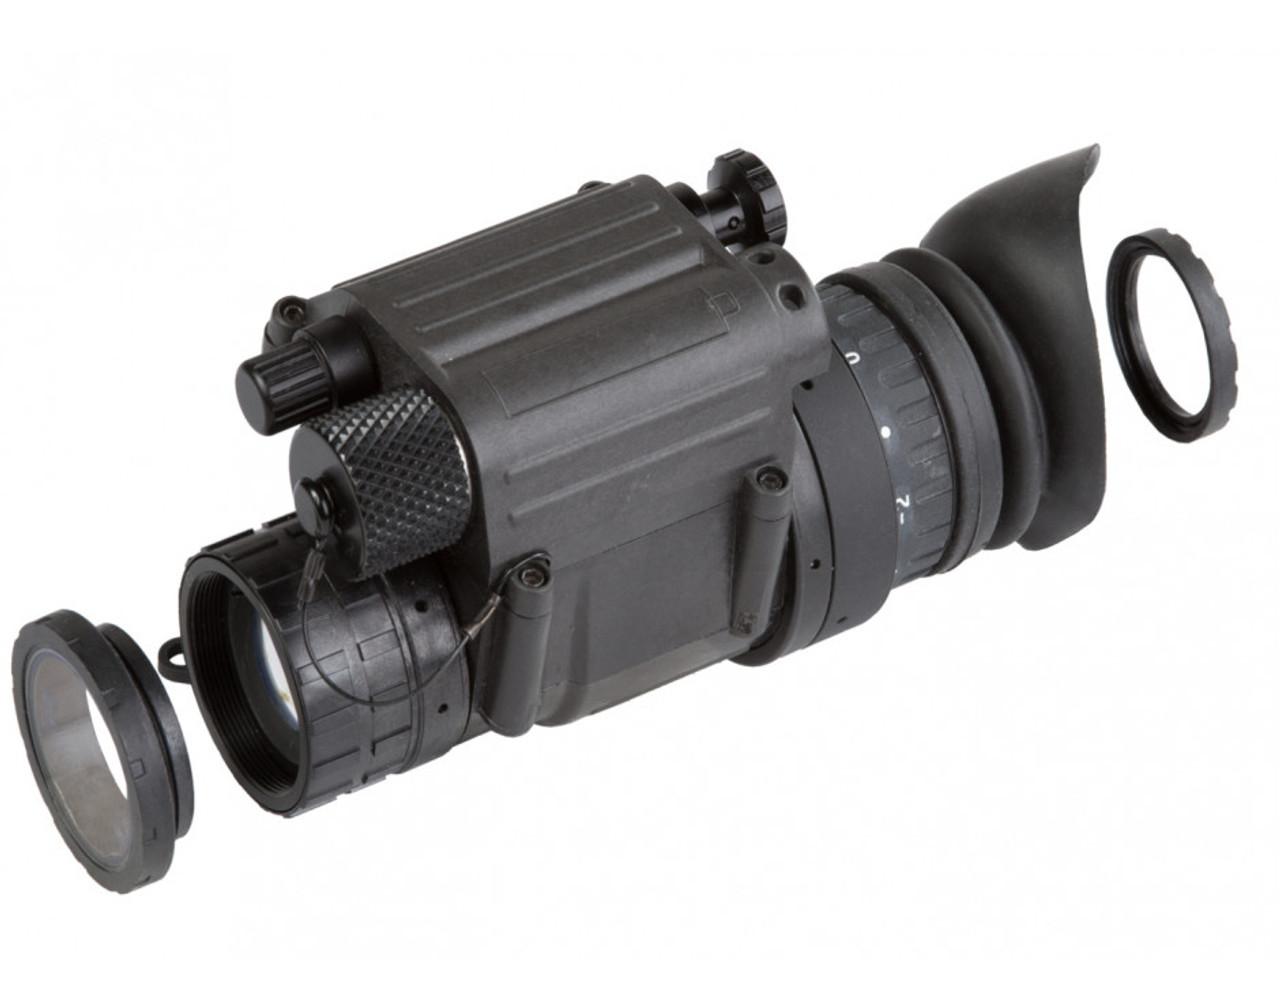 "AGM PVS-14 3AL3 Night Vision Monocular Gen 3+ Auto-Gated ""Level 3"" (AGM PVS-14 3AL3)"